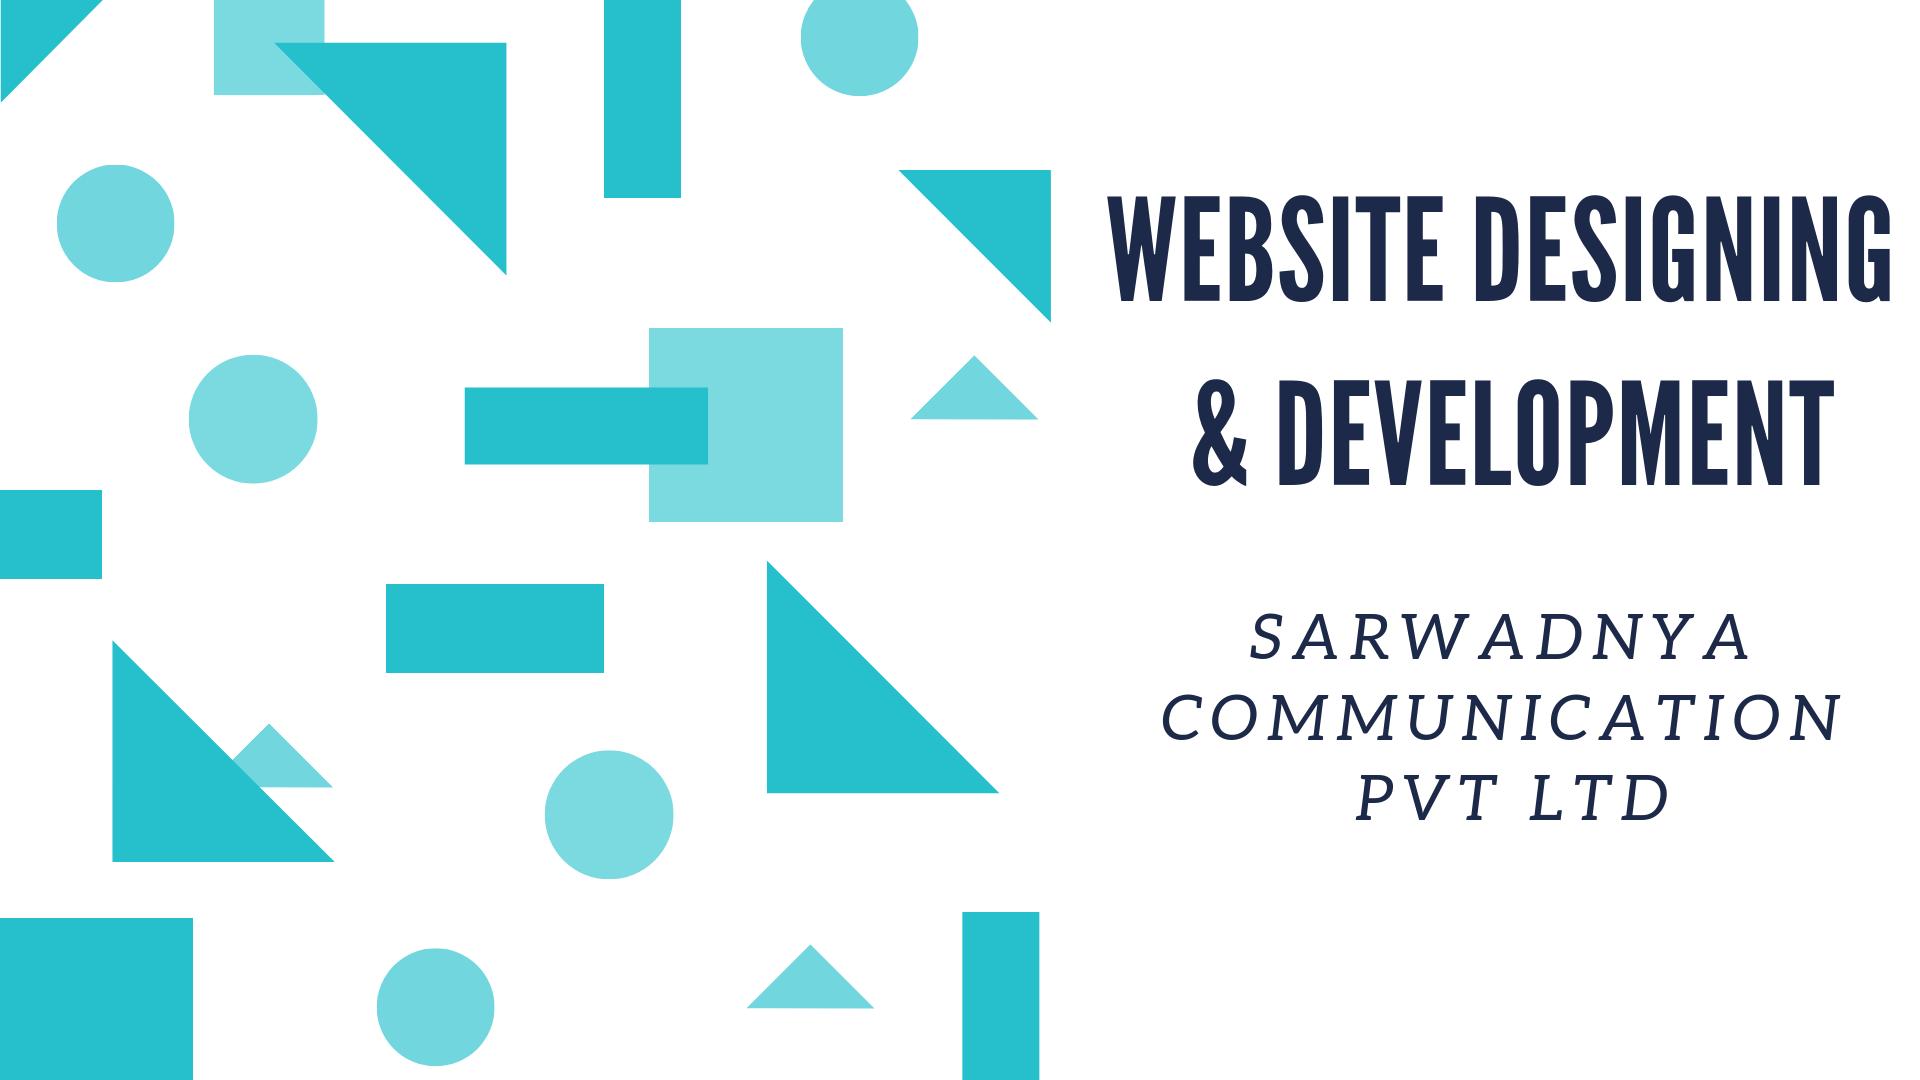 Website designing & development – Sarwadnya Communication